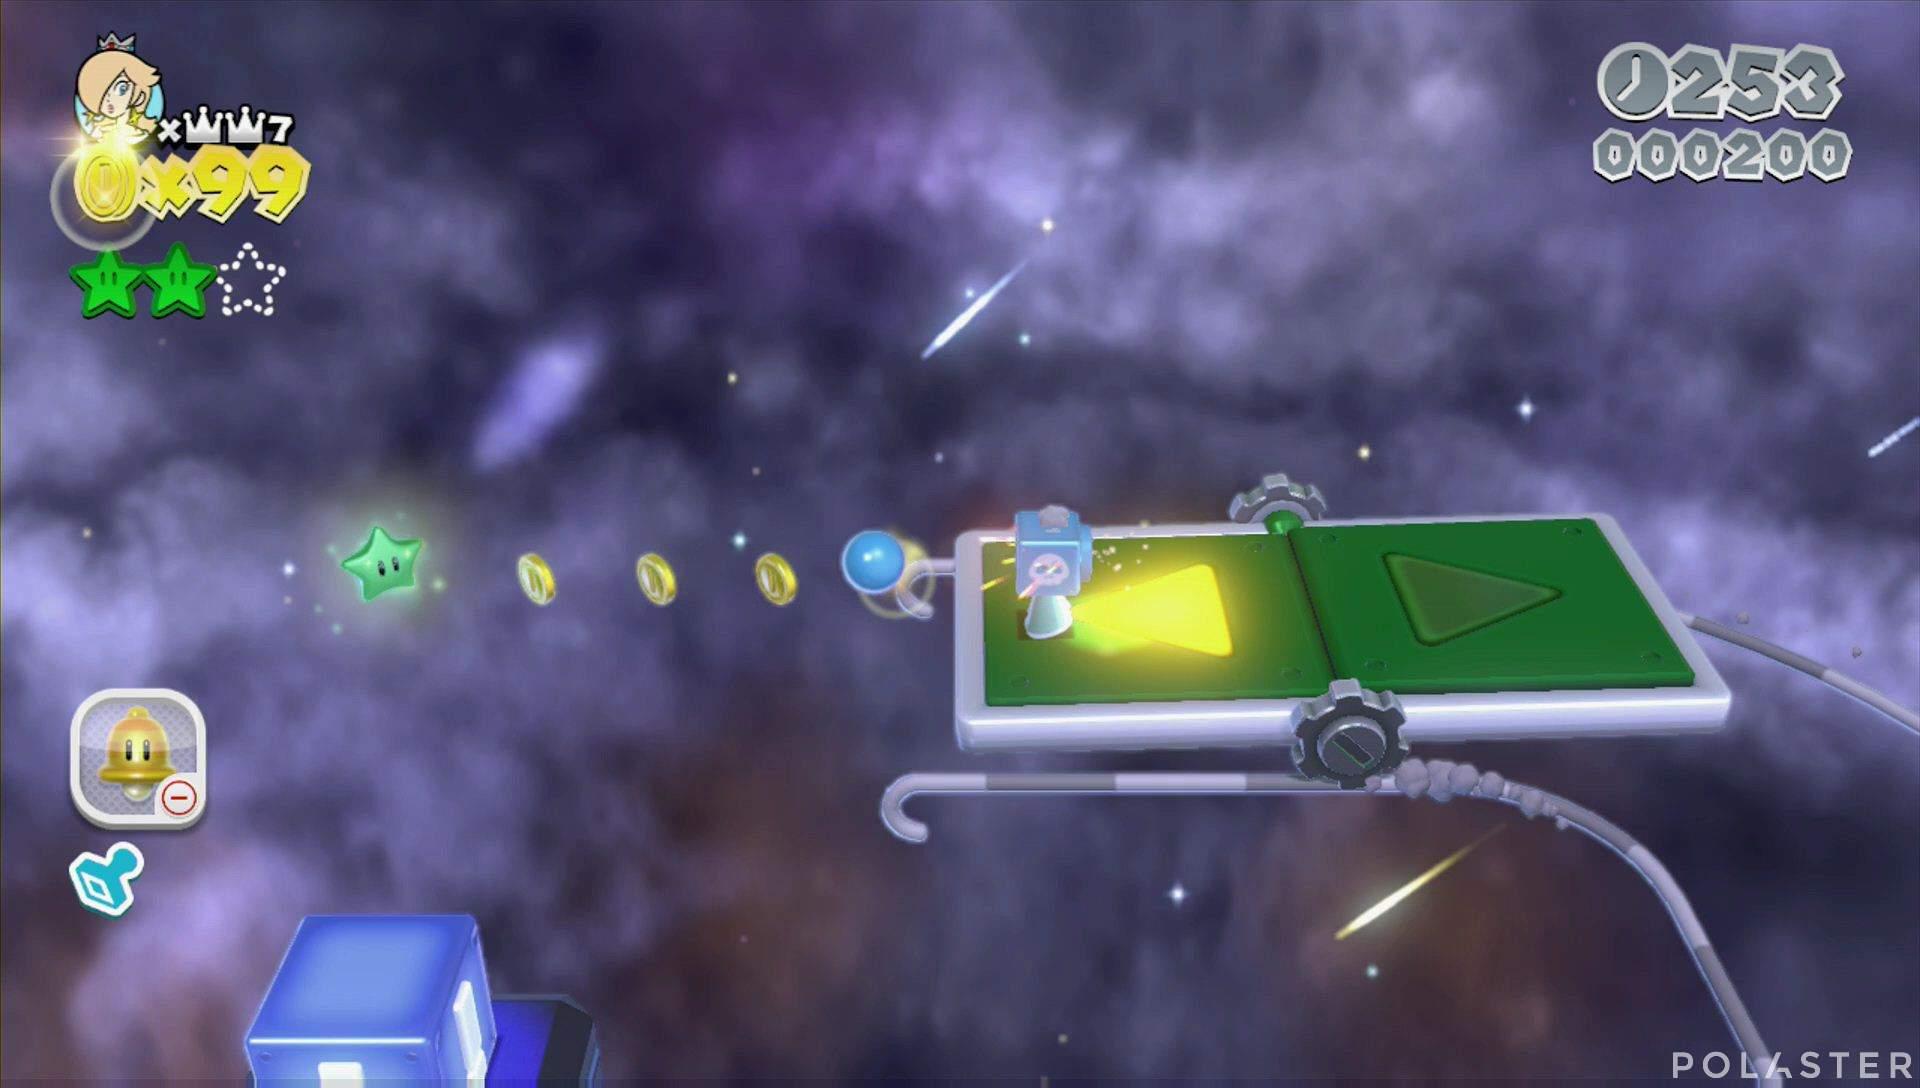 Super Mario 3D World Mundo Estrella-9 Estrella 3